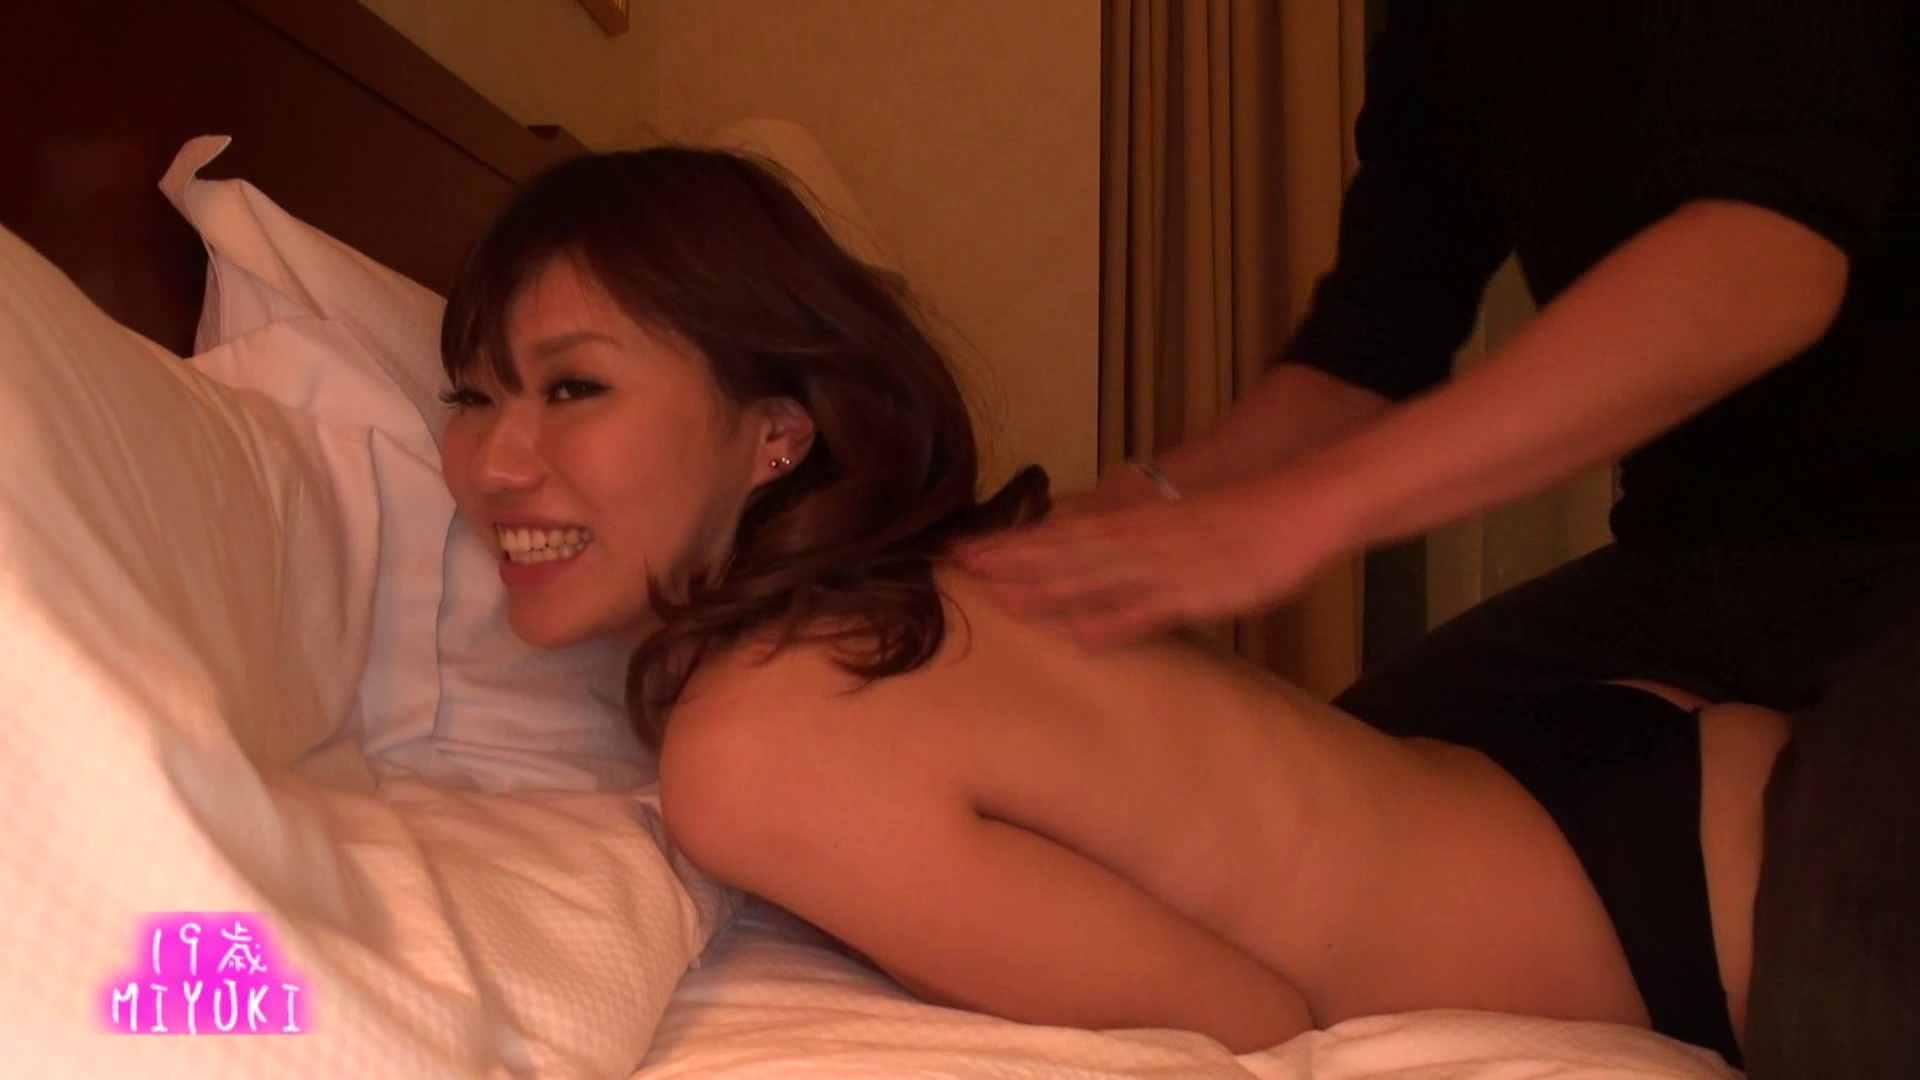 MIYUKIちゃんに男優さんがエロマッサージ メーカー直接買い取り  104pic 30